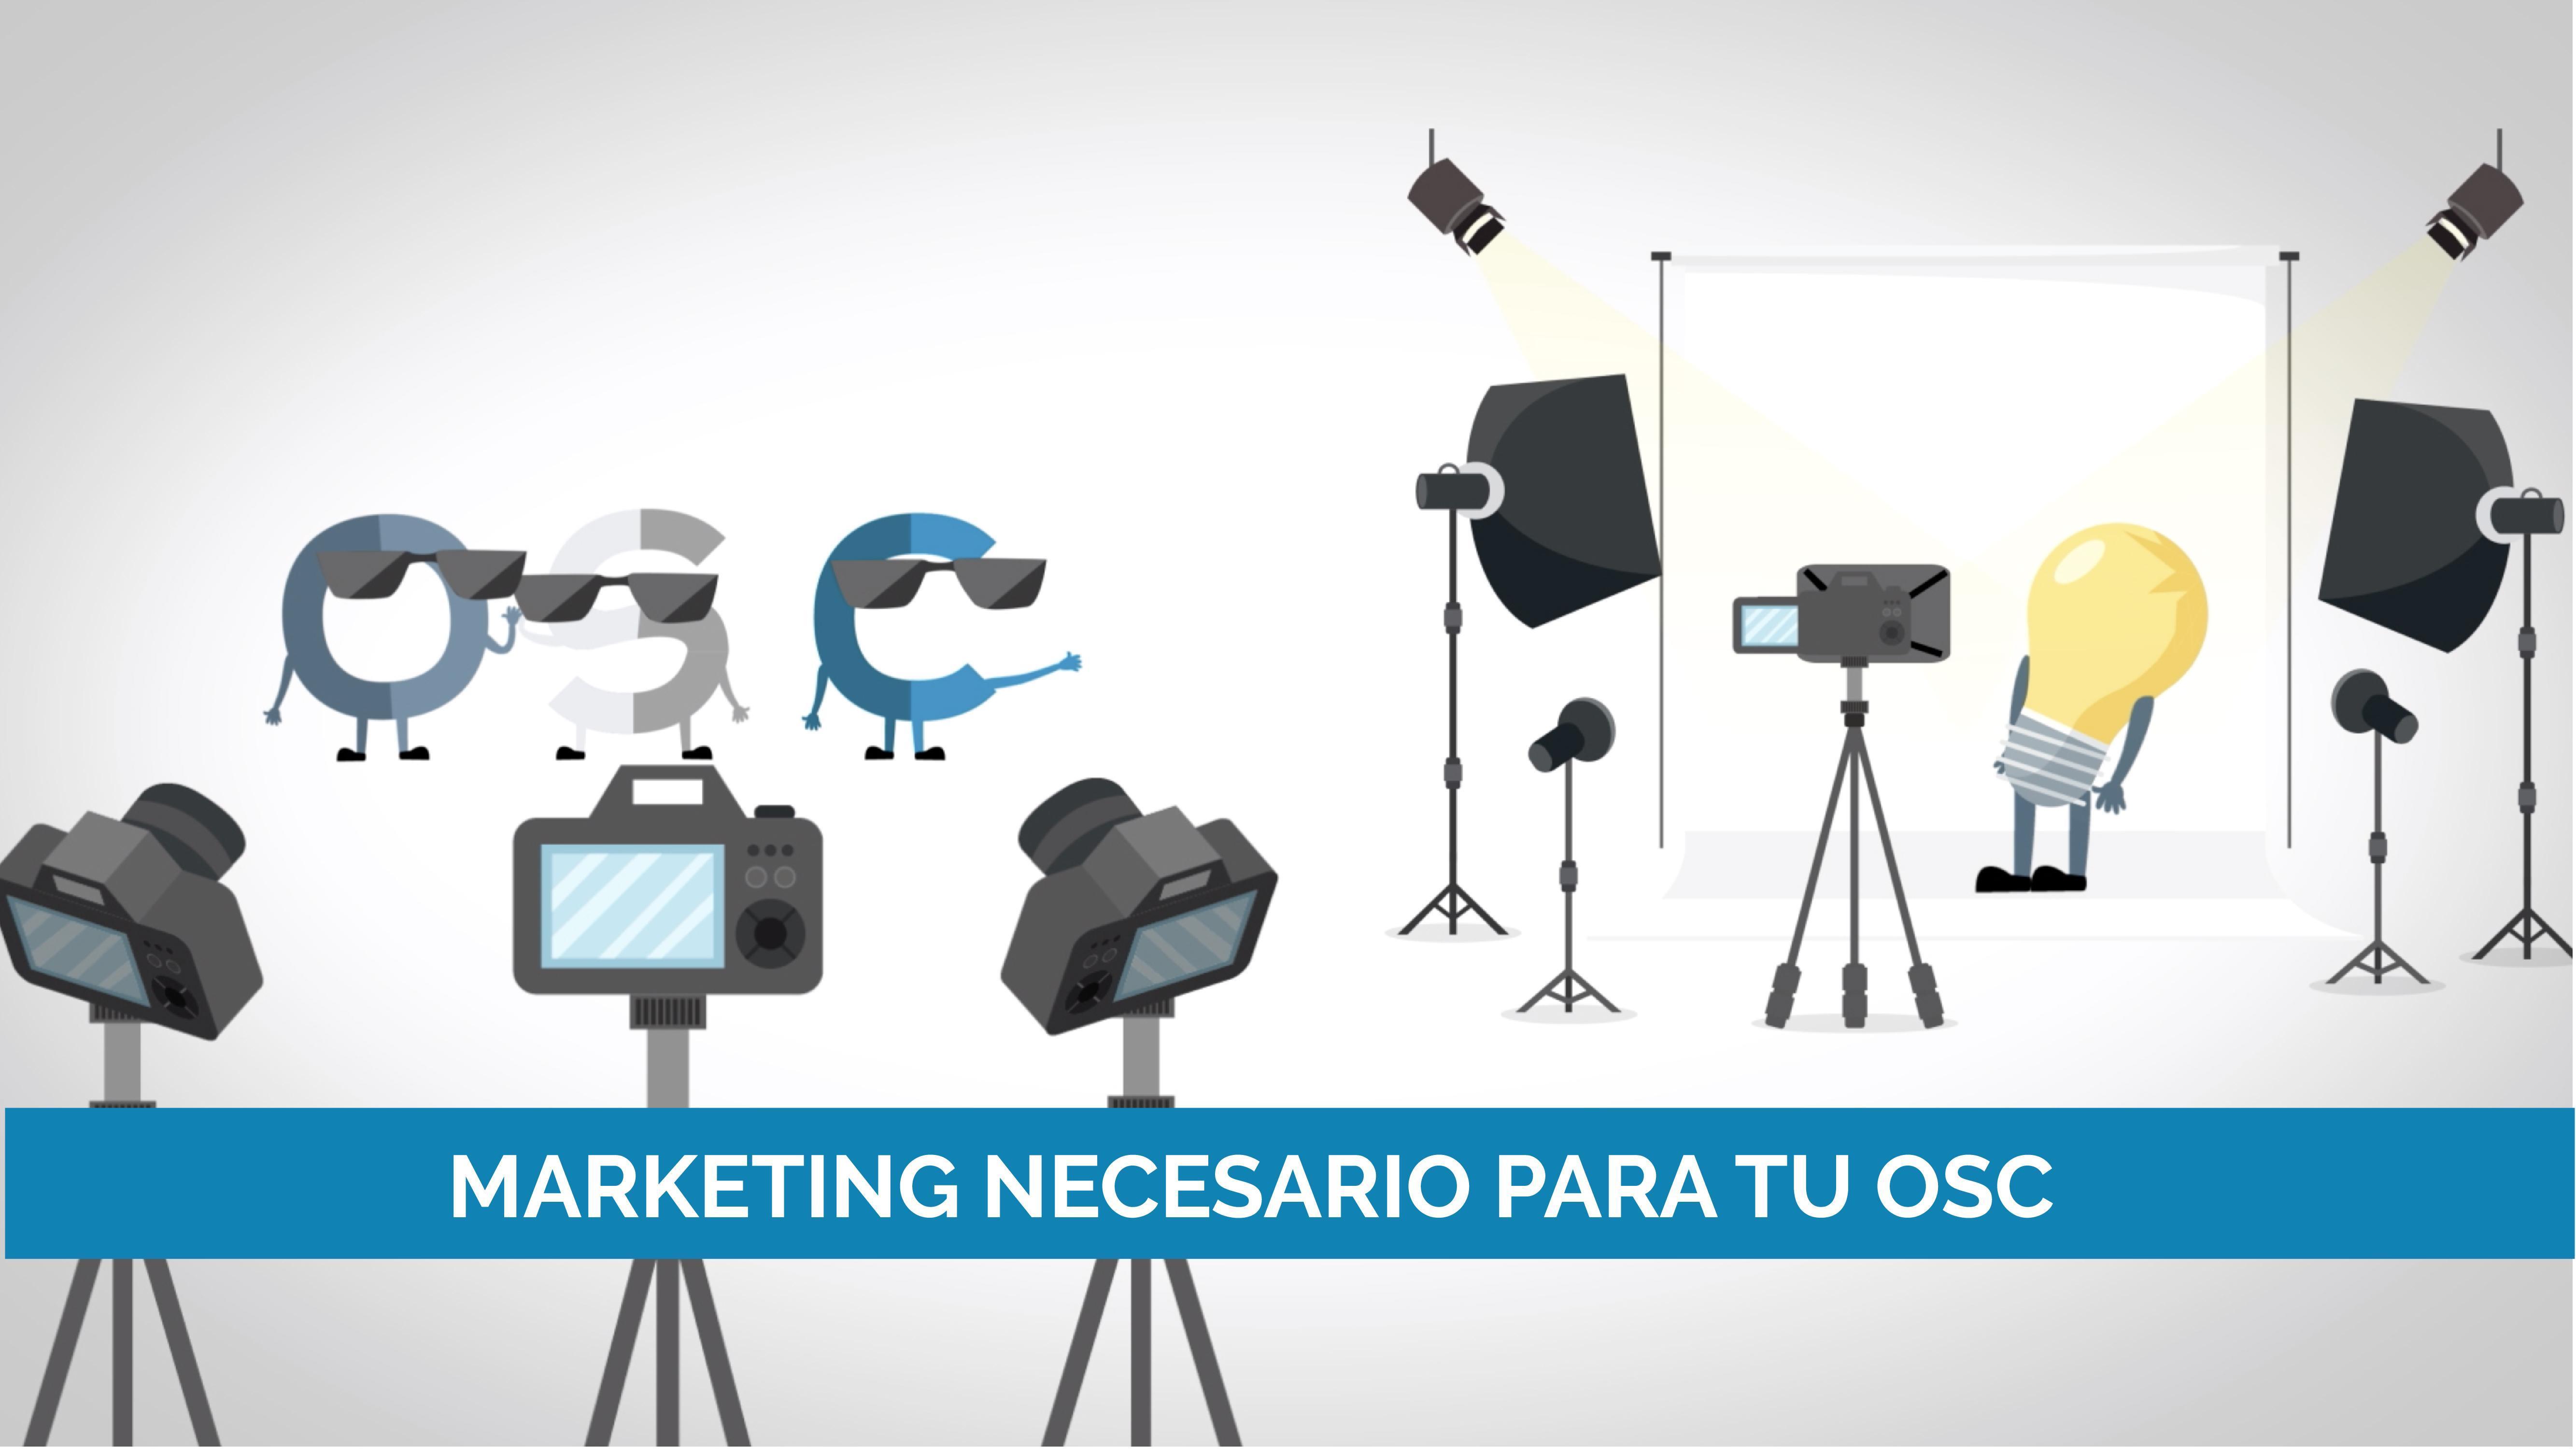 Marketing necesarios para tu OSC